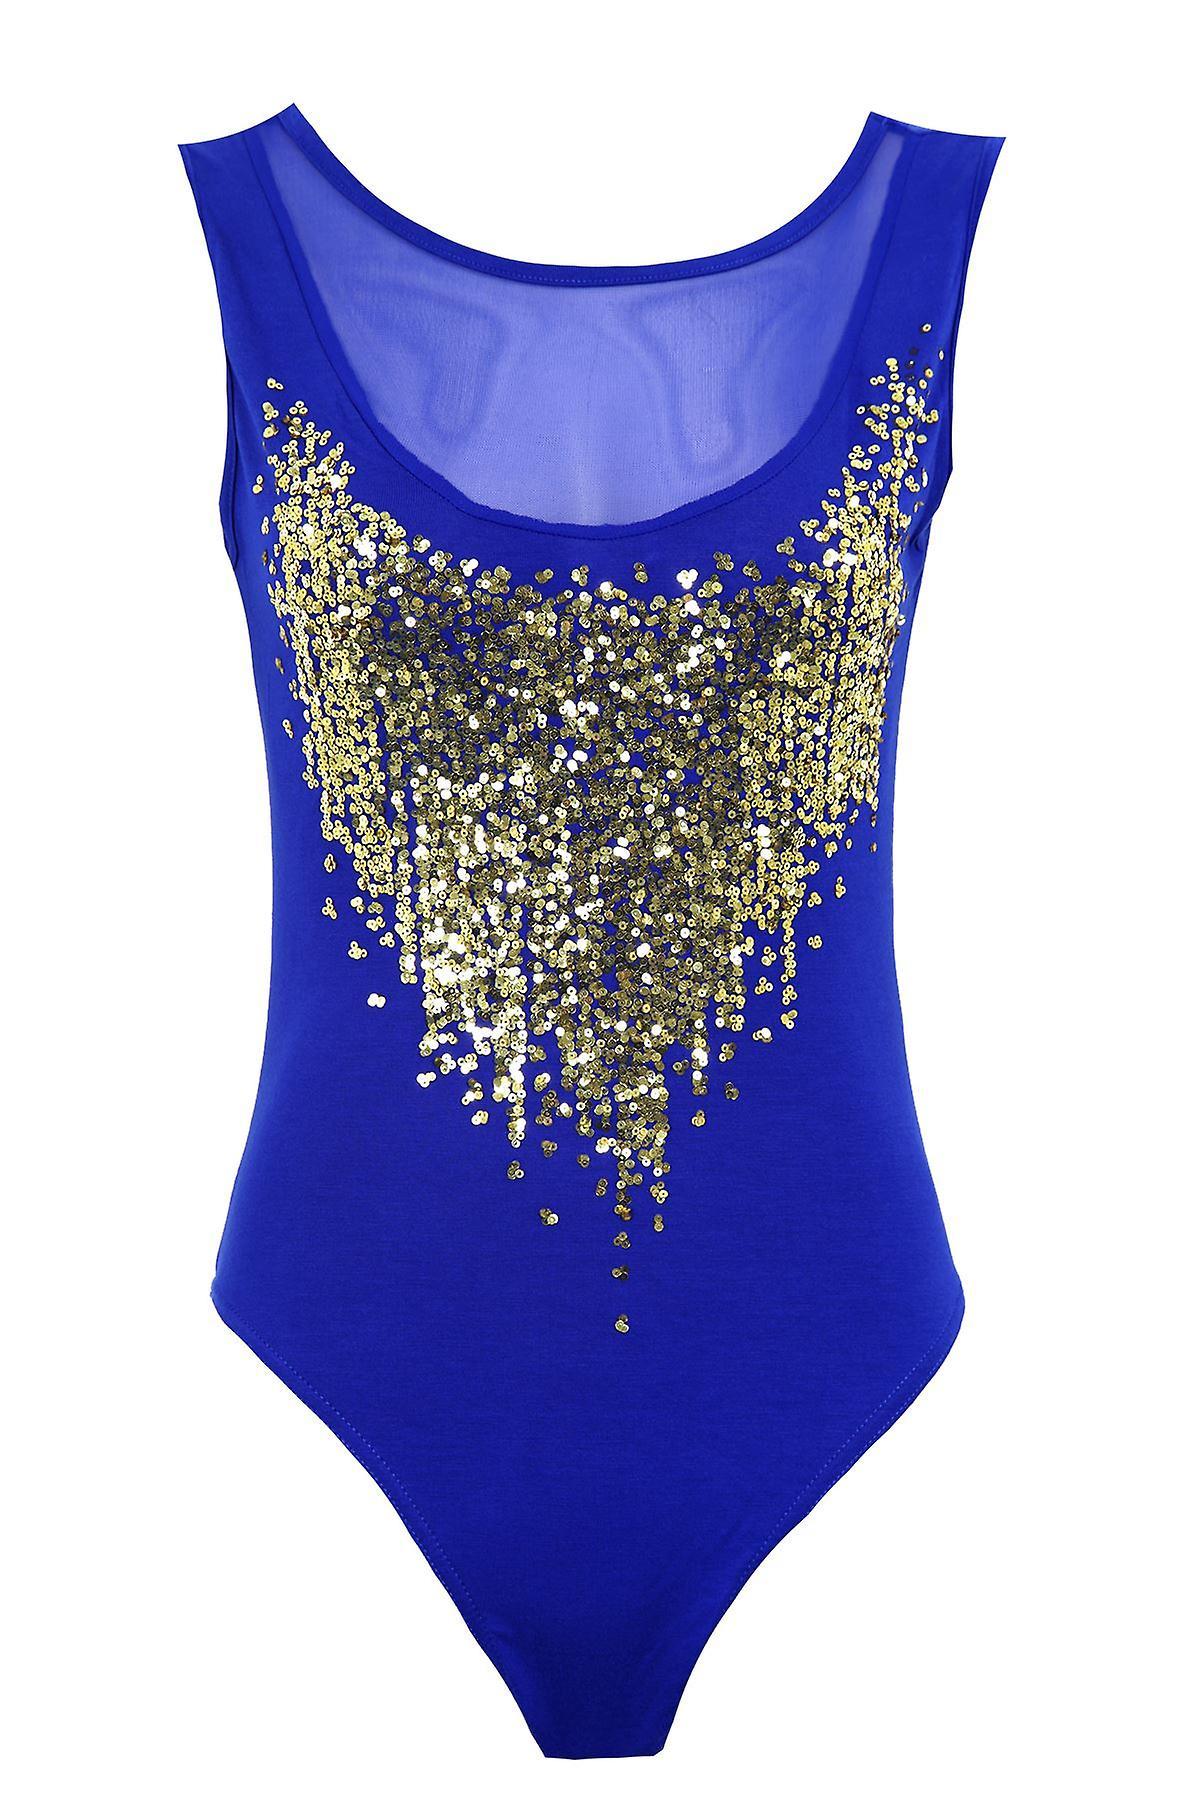 Ladies Sheer Gold Sequin Mesh Insert Low Back Leotard Womens Bodysuit Top